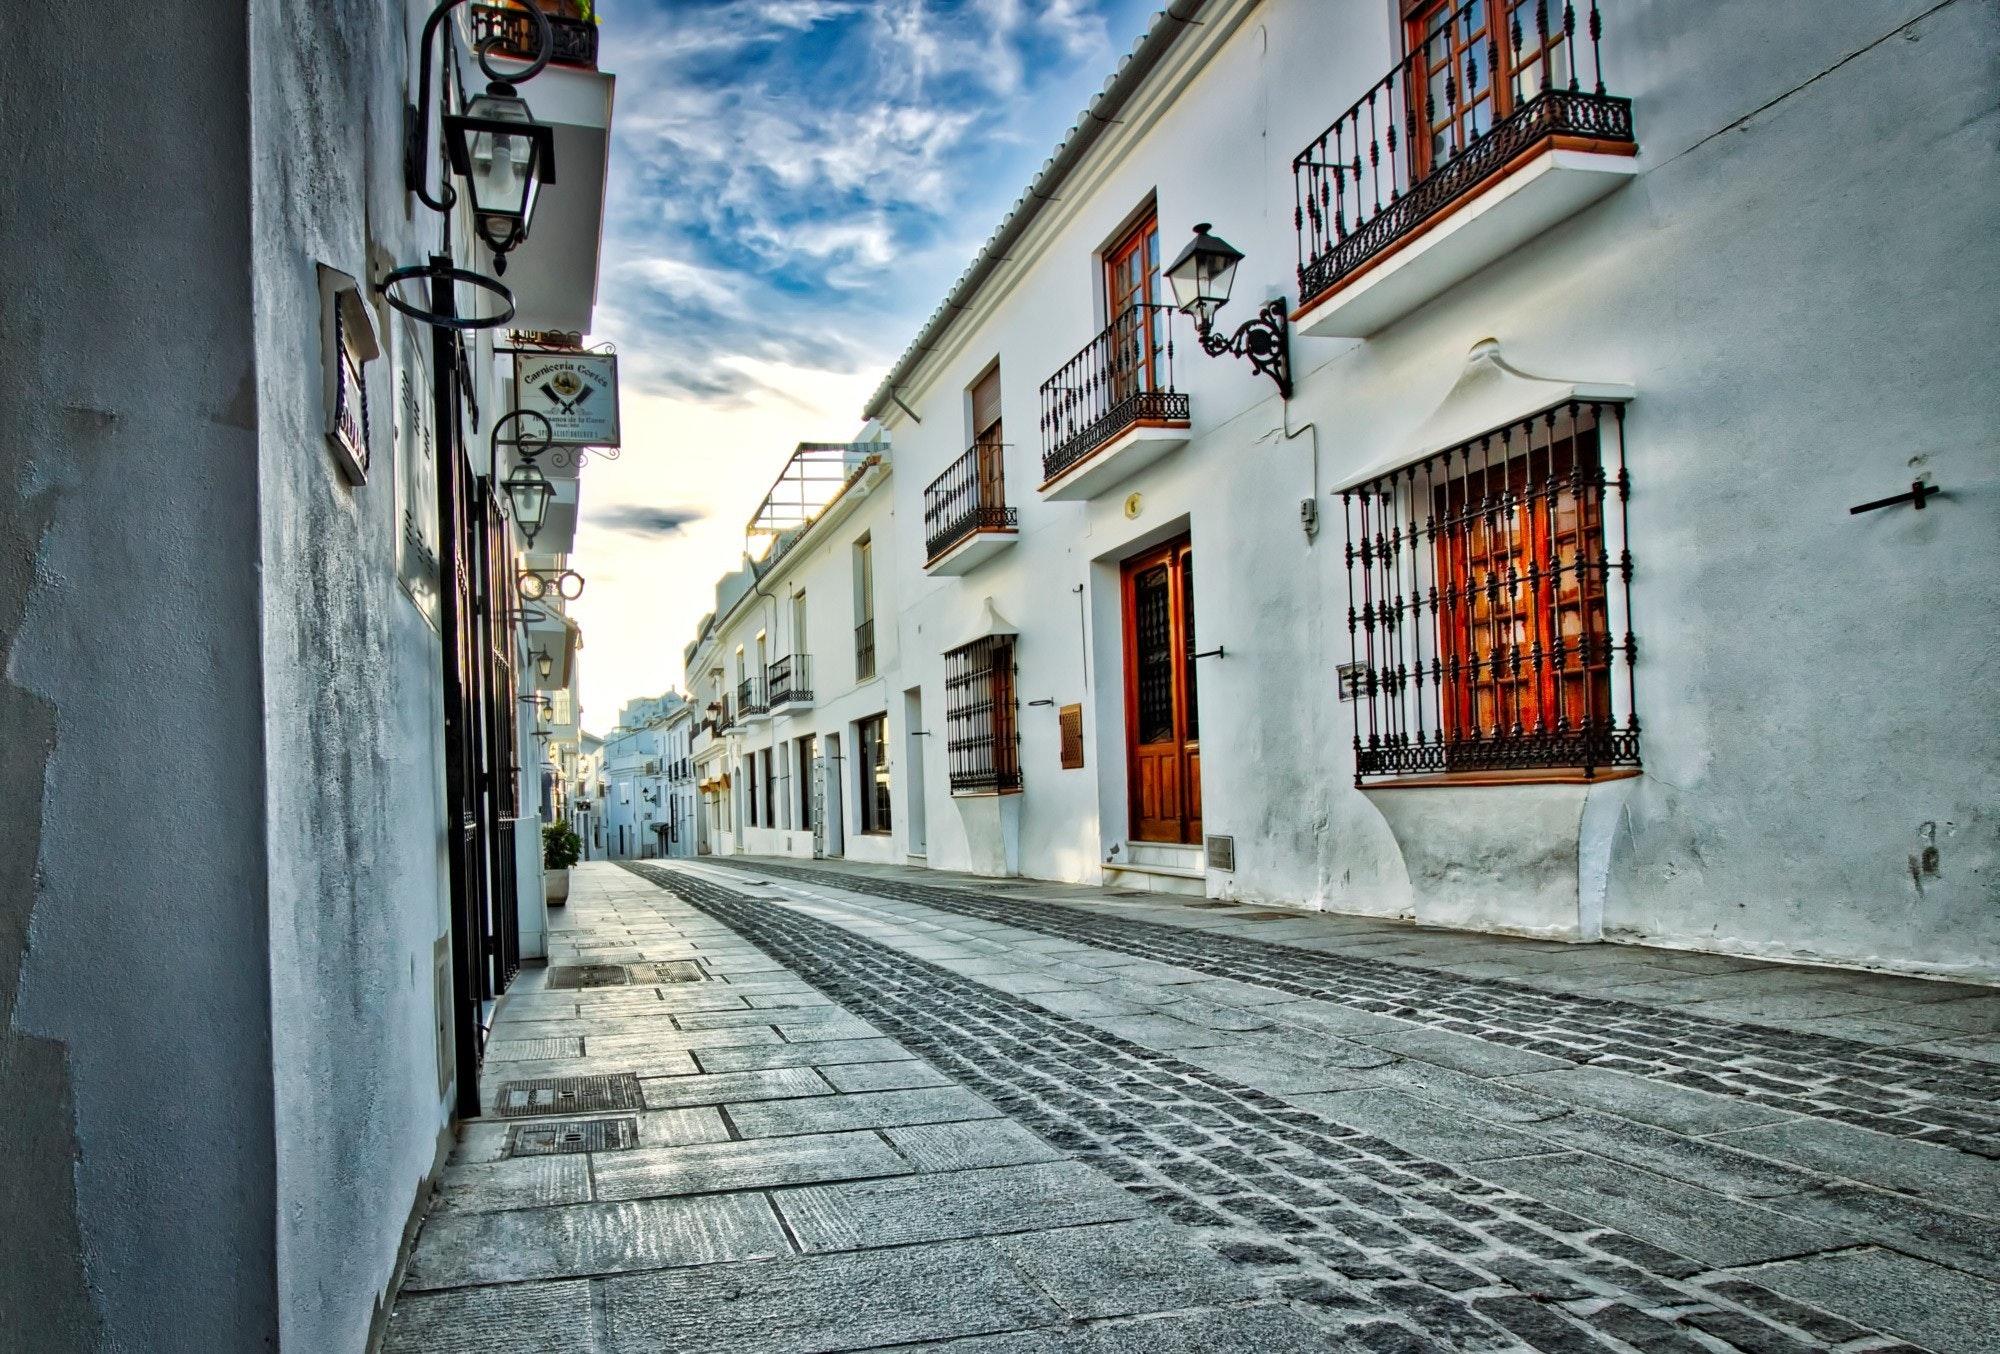 uliczka w Hiszpani